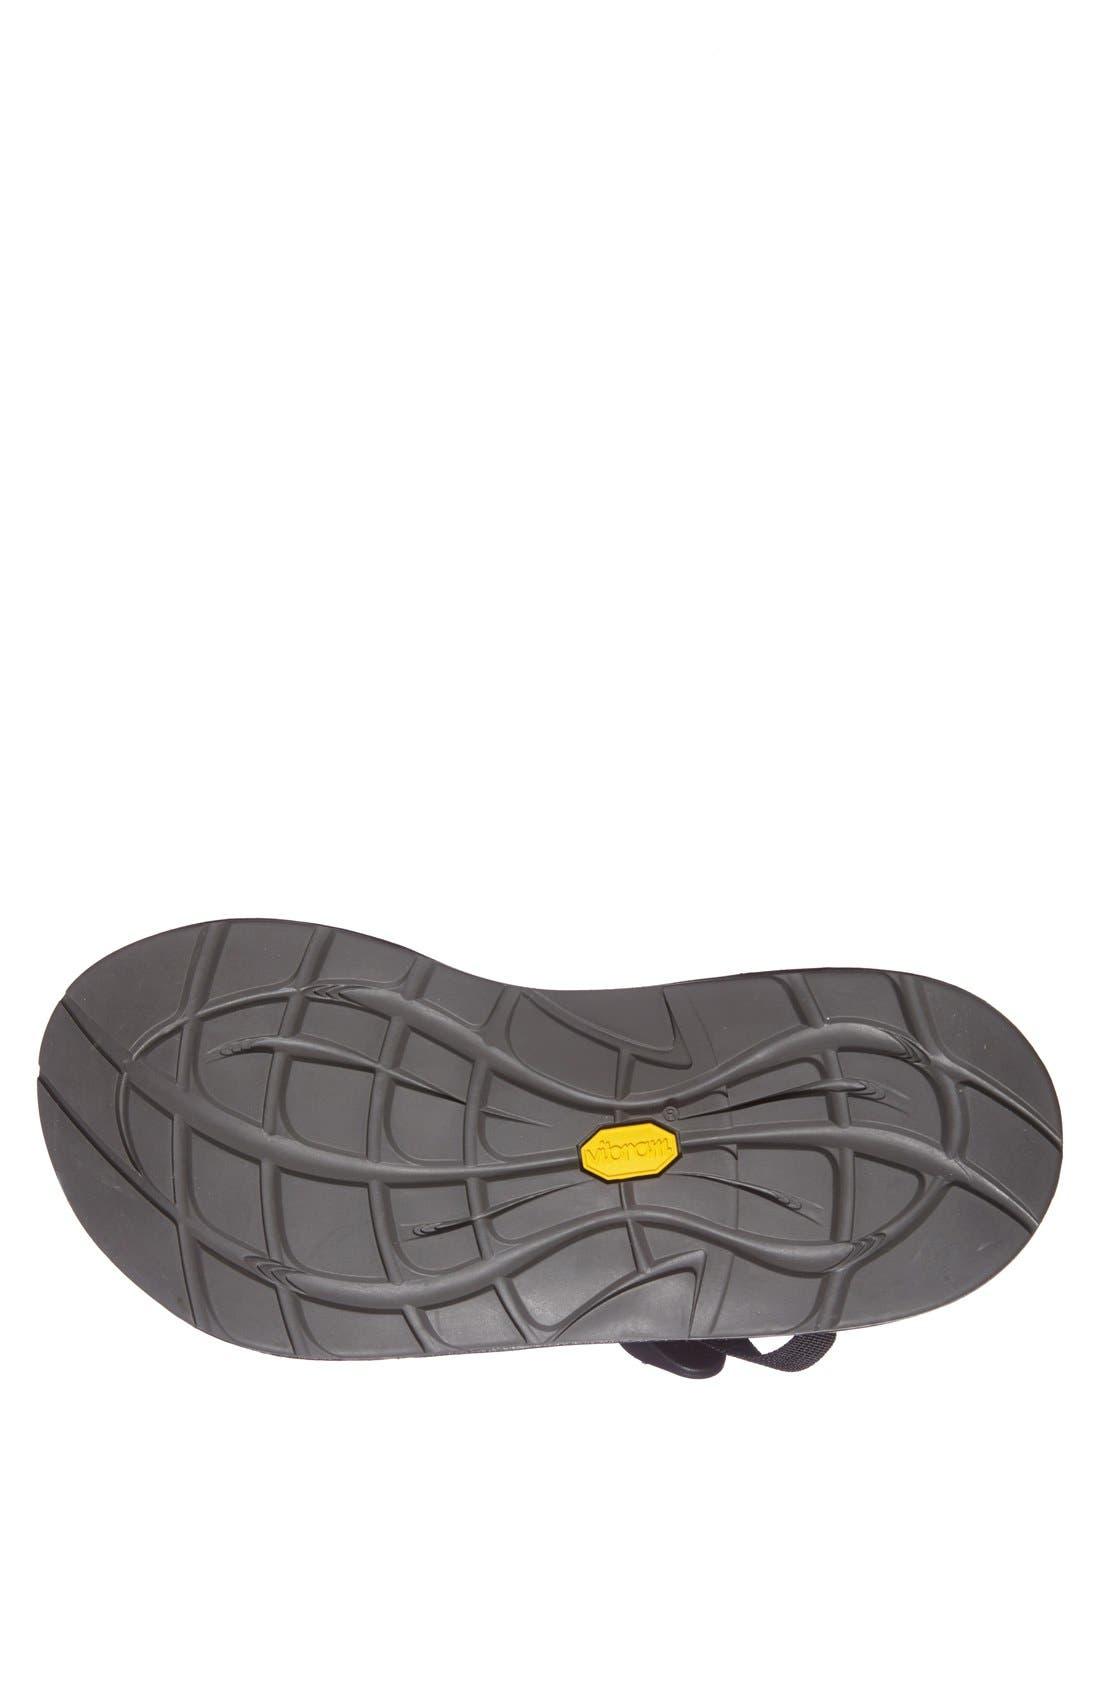 Alternate Image 4  - Chaco 'Z/2 Yampa' Sandal